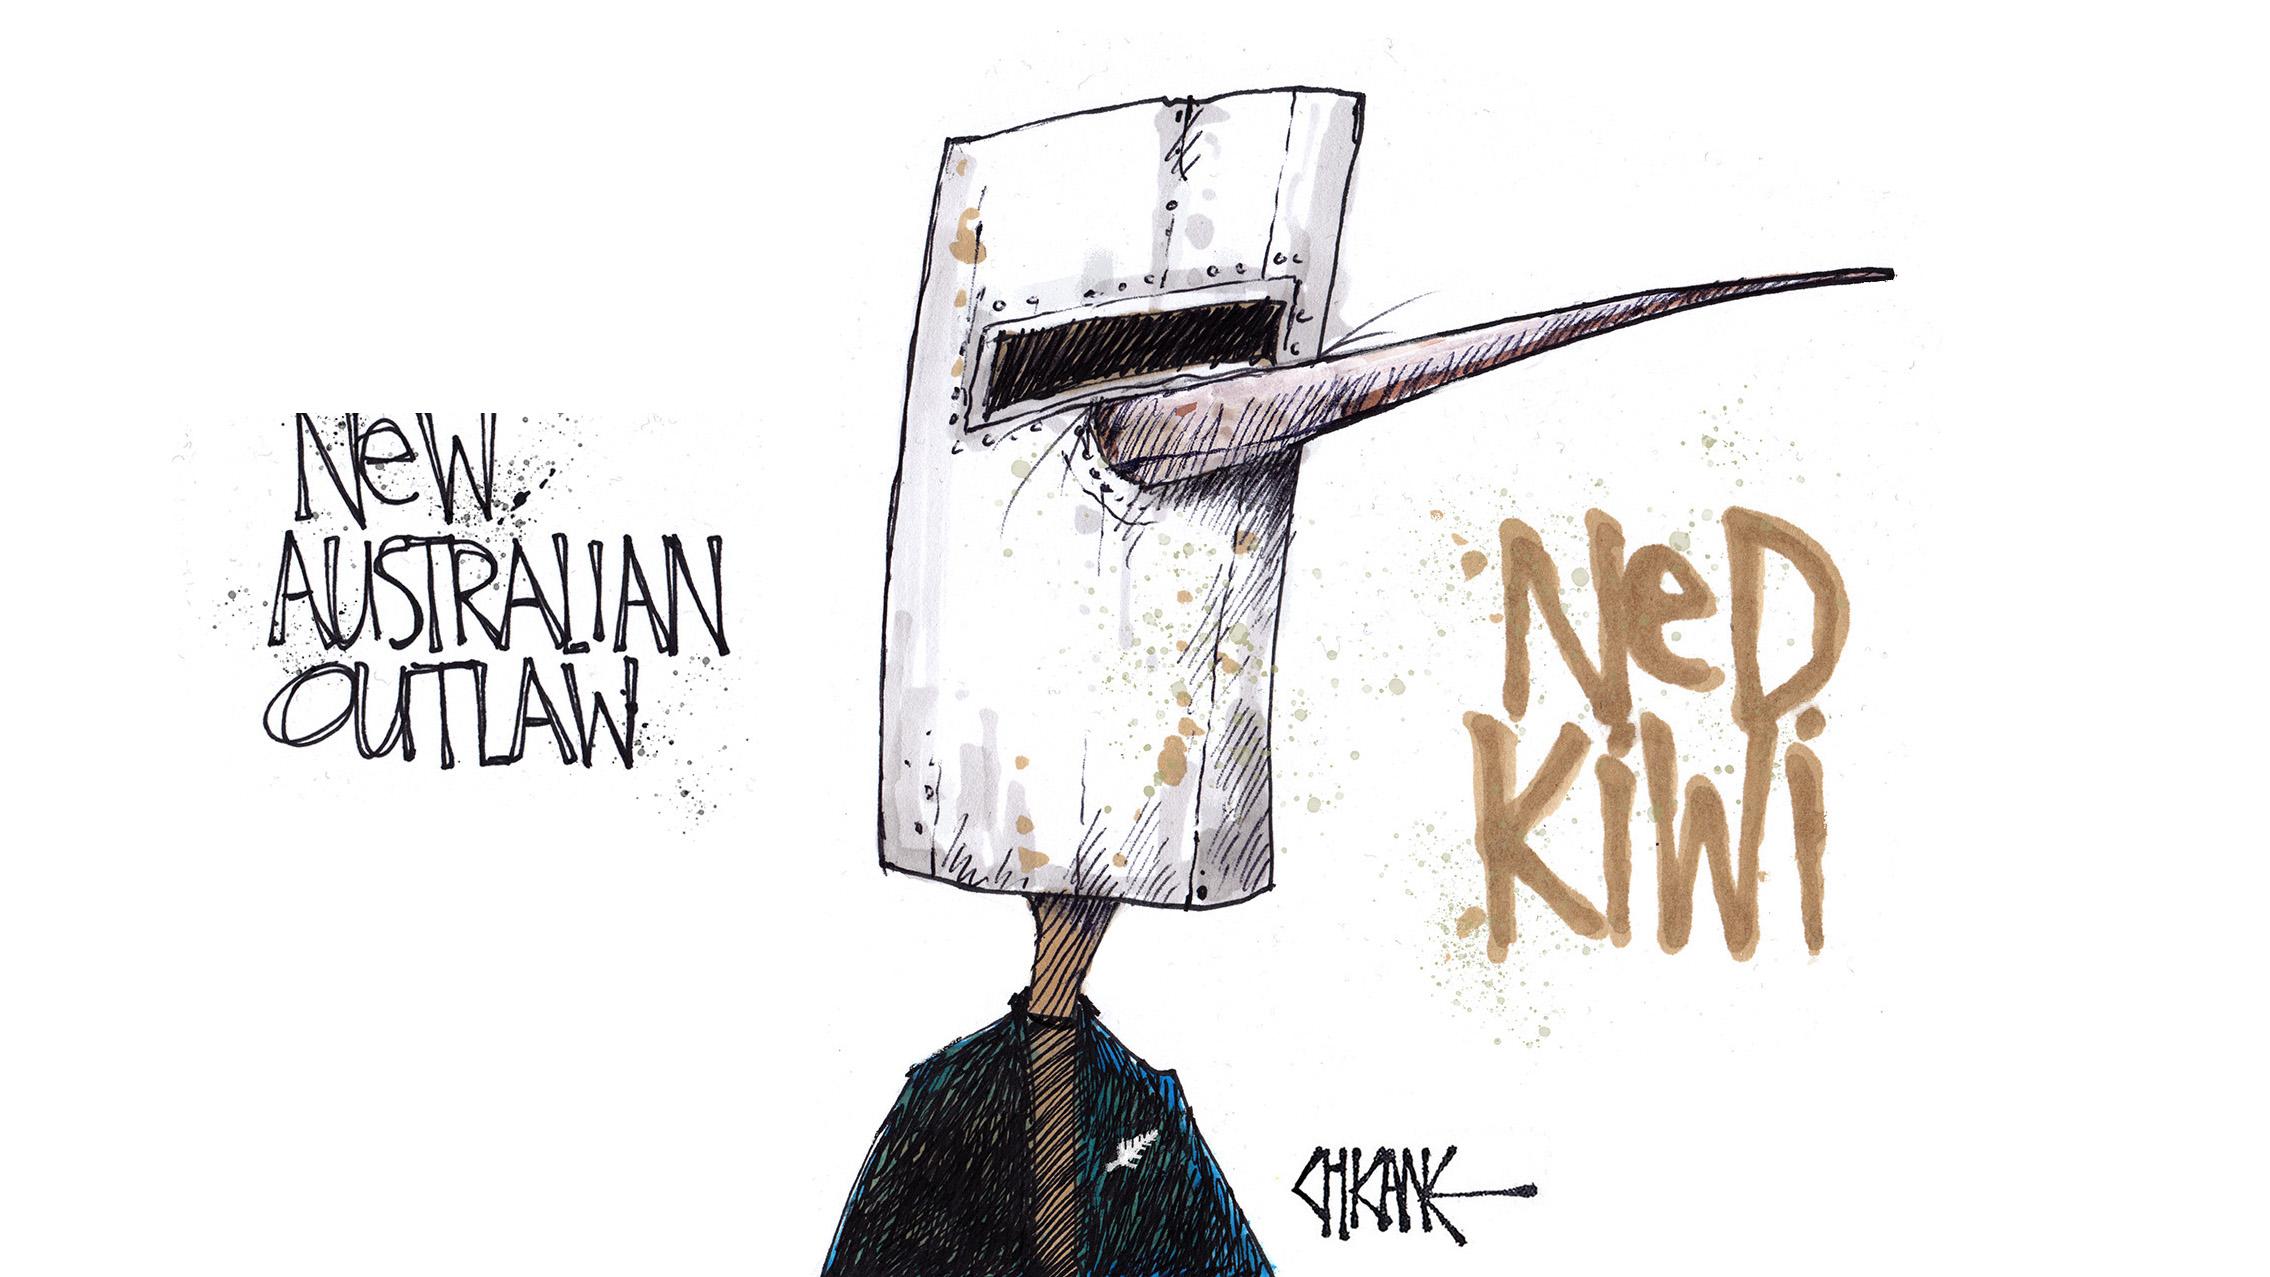 Ned Kiwi Cartoon by Chicane